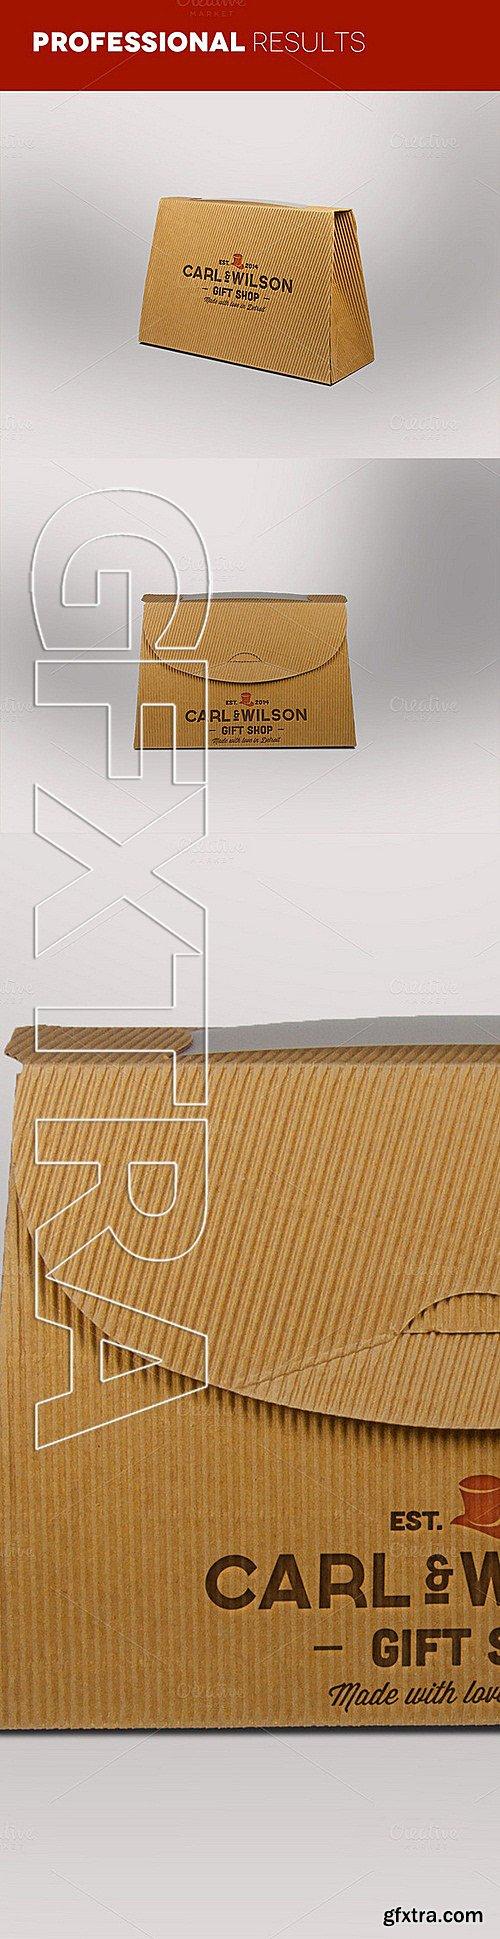 CM - Logo on cardboard box mokcups 302987